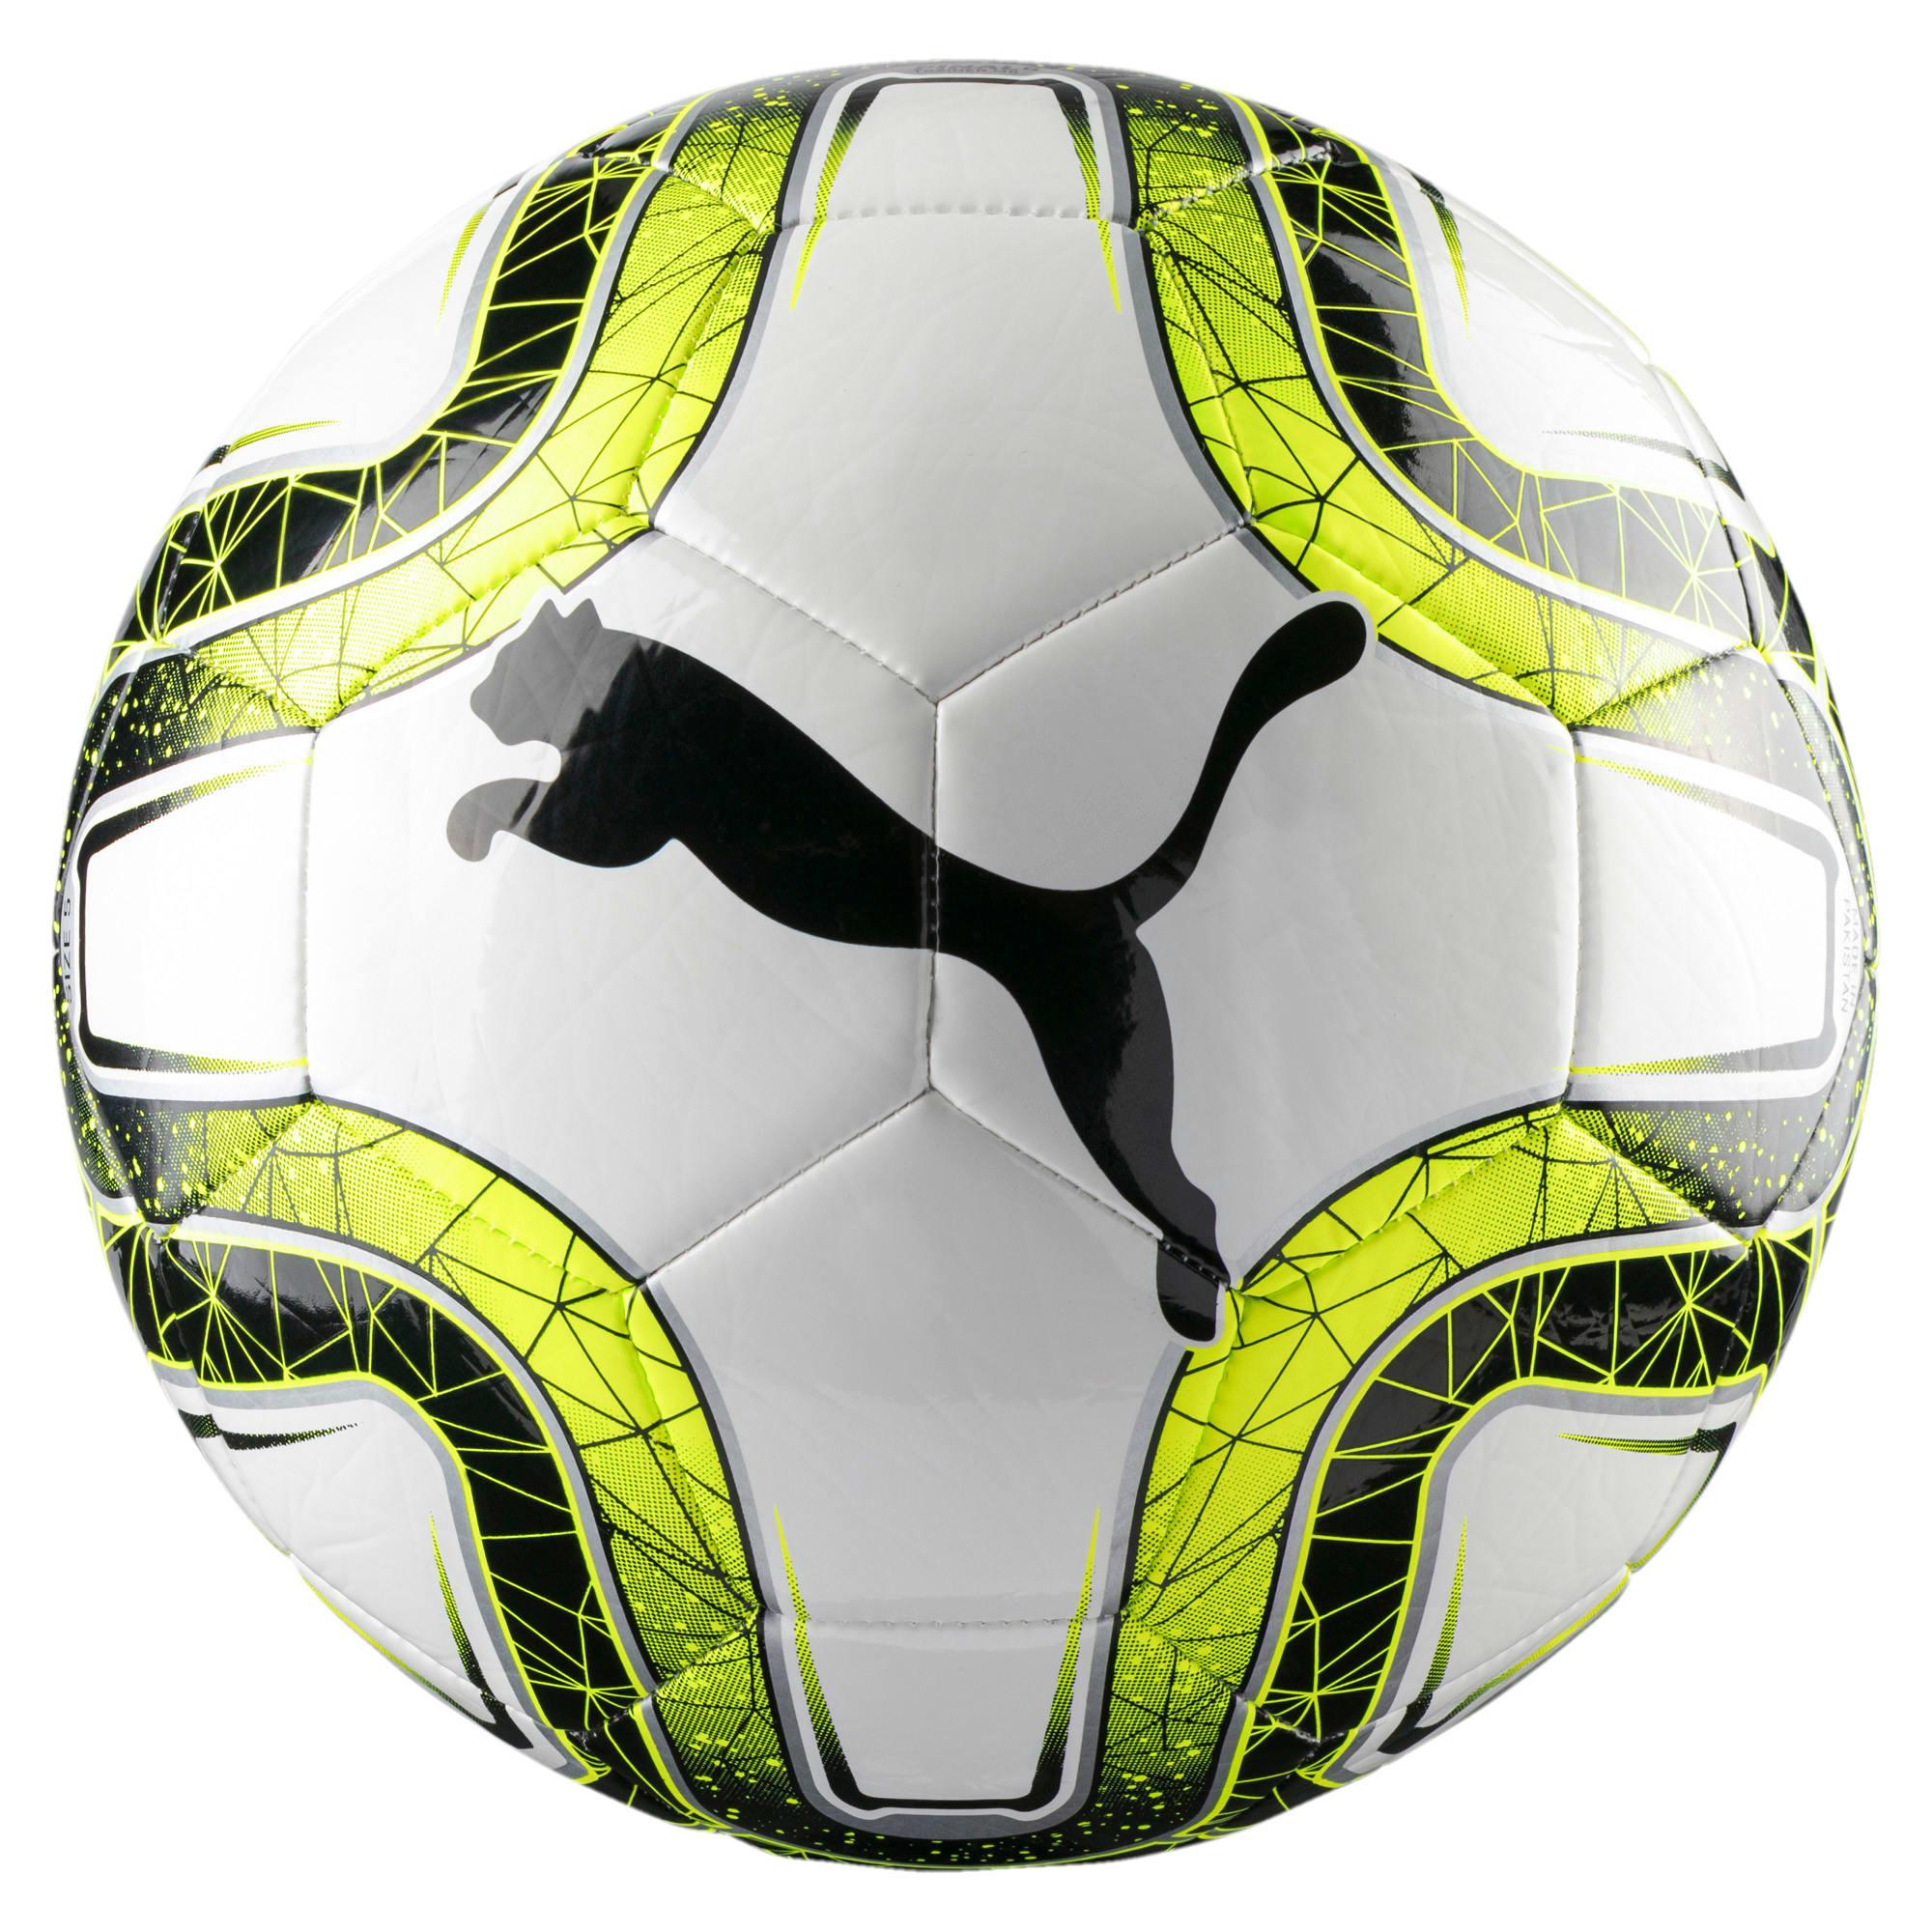 Thumbnail 1 of FINAL 6 MS Training Football, White-Lemon Tonic-Black, medium